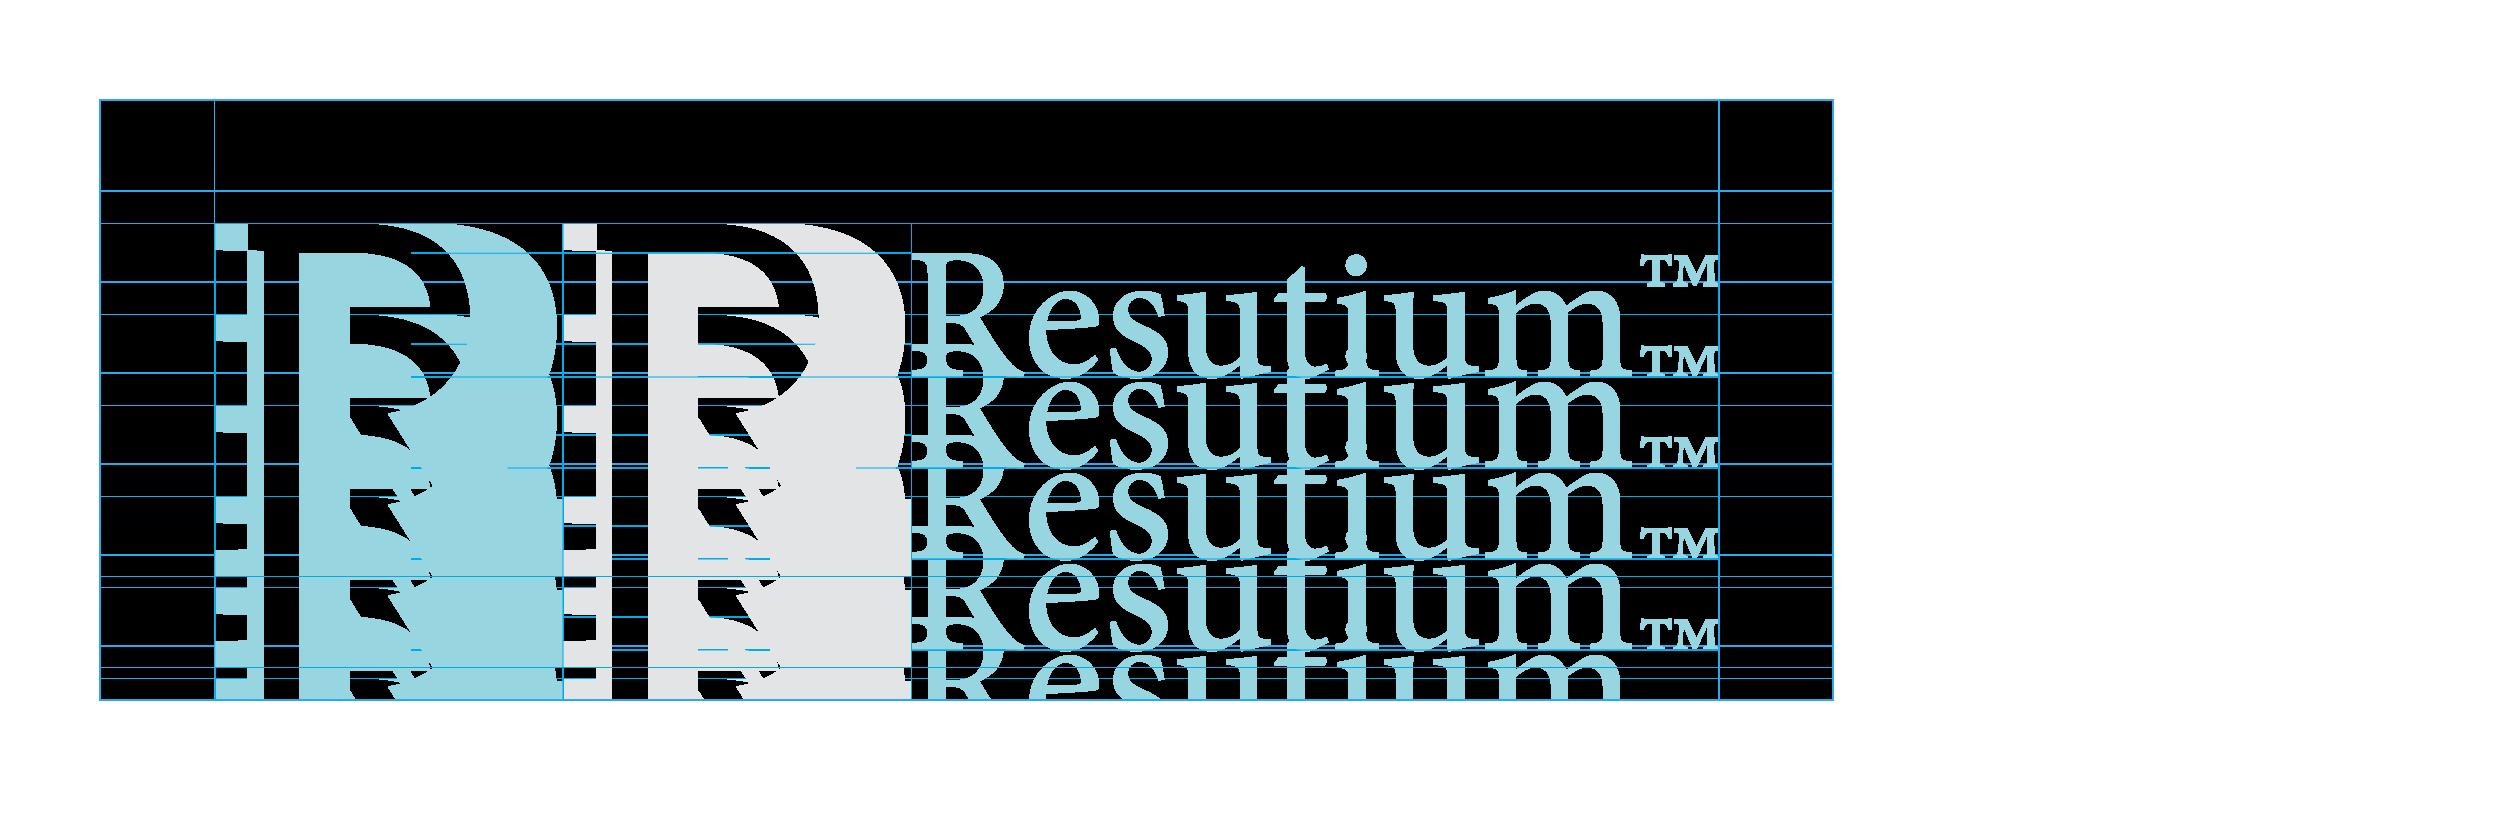 BCD_Projects_ID_Resutium_02